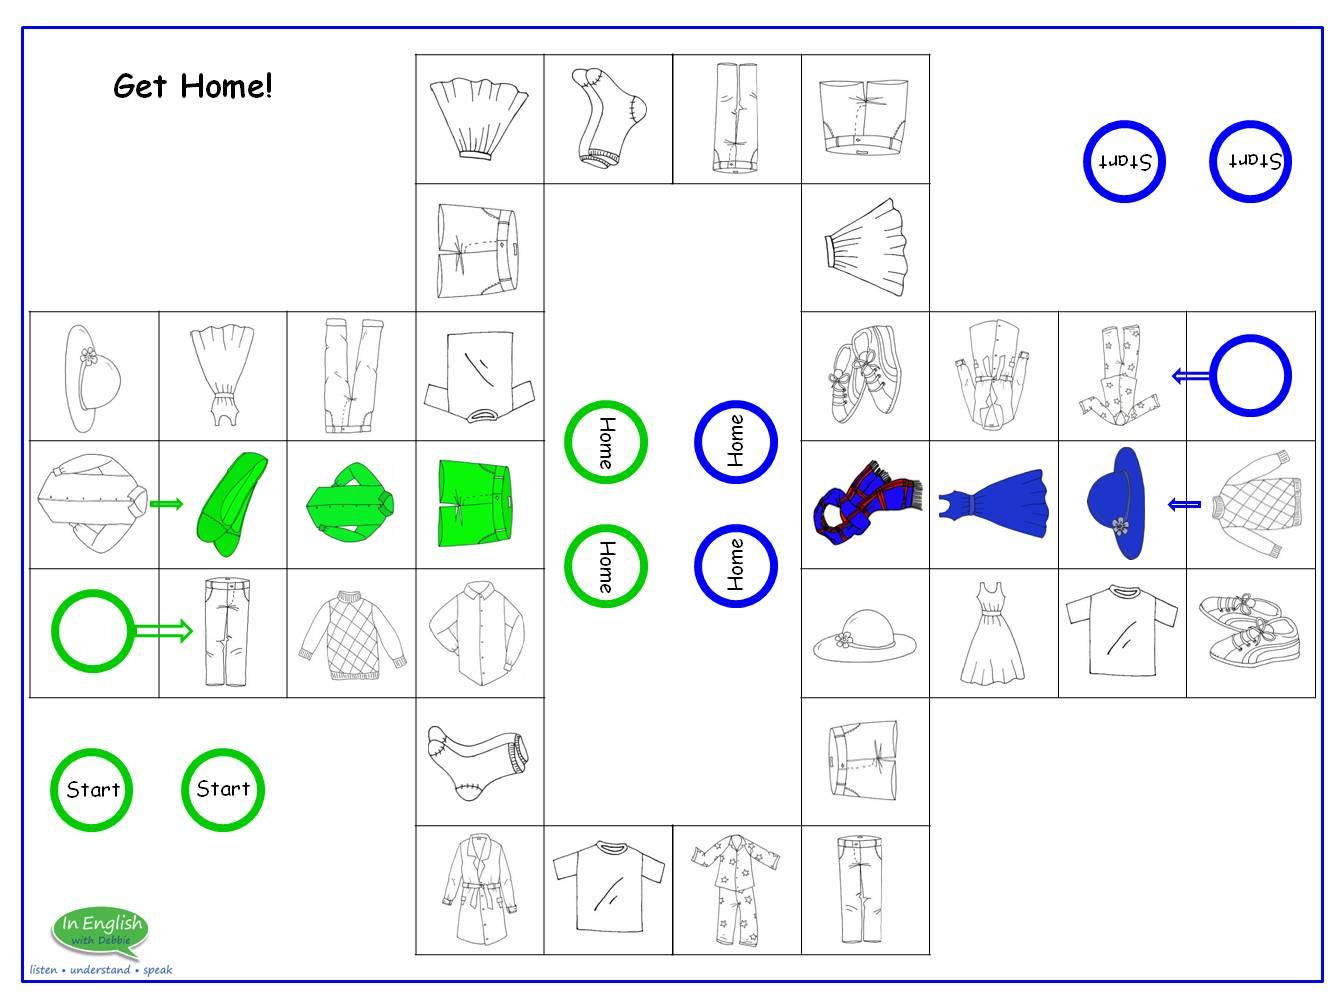 Speak Easy ESL Clothes Home Board Game